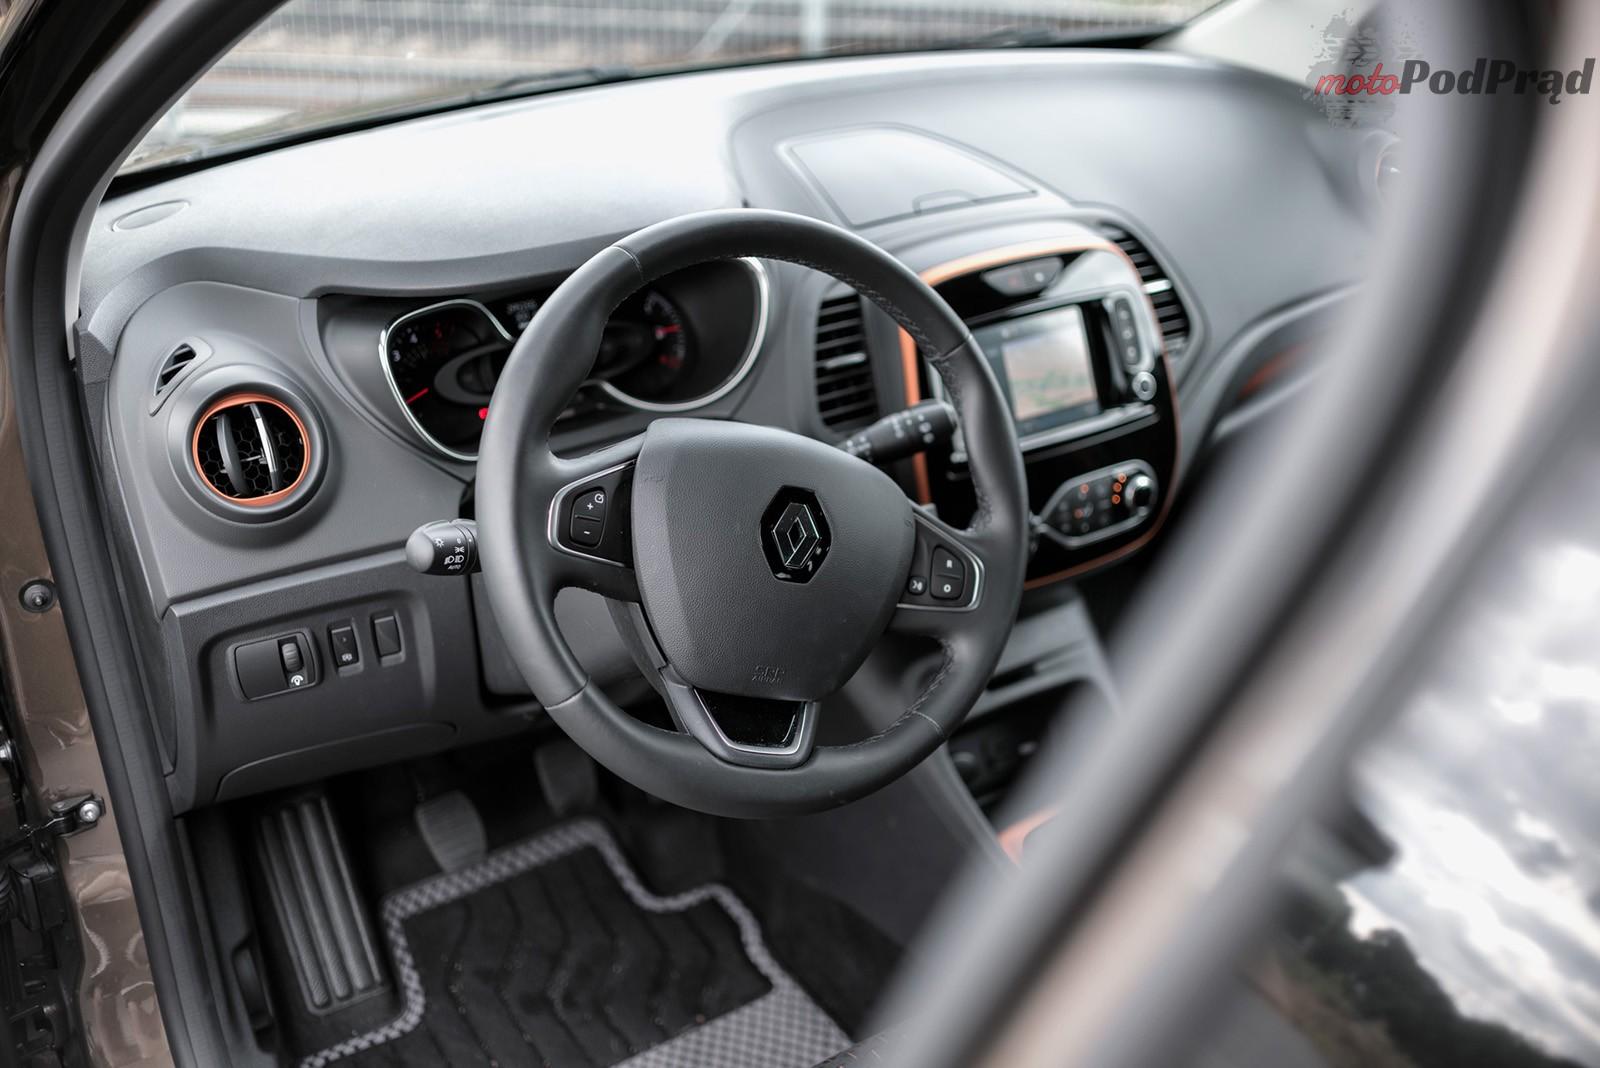 Renault Captur 20 Test: Renault Captur 1.5 dCi 110 KM   Clio inaczej